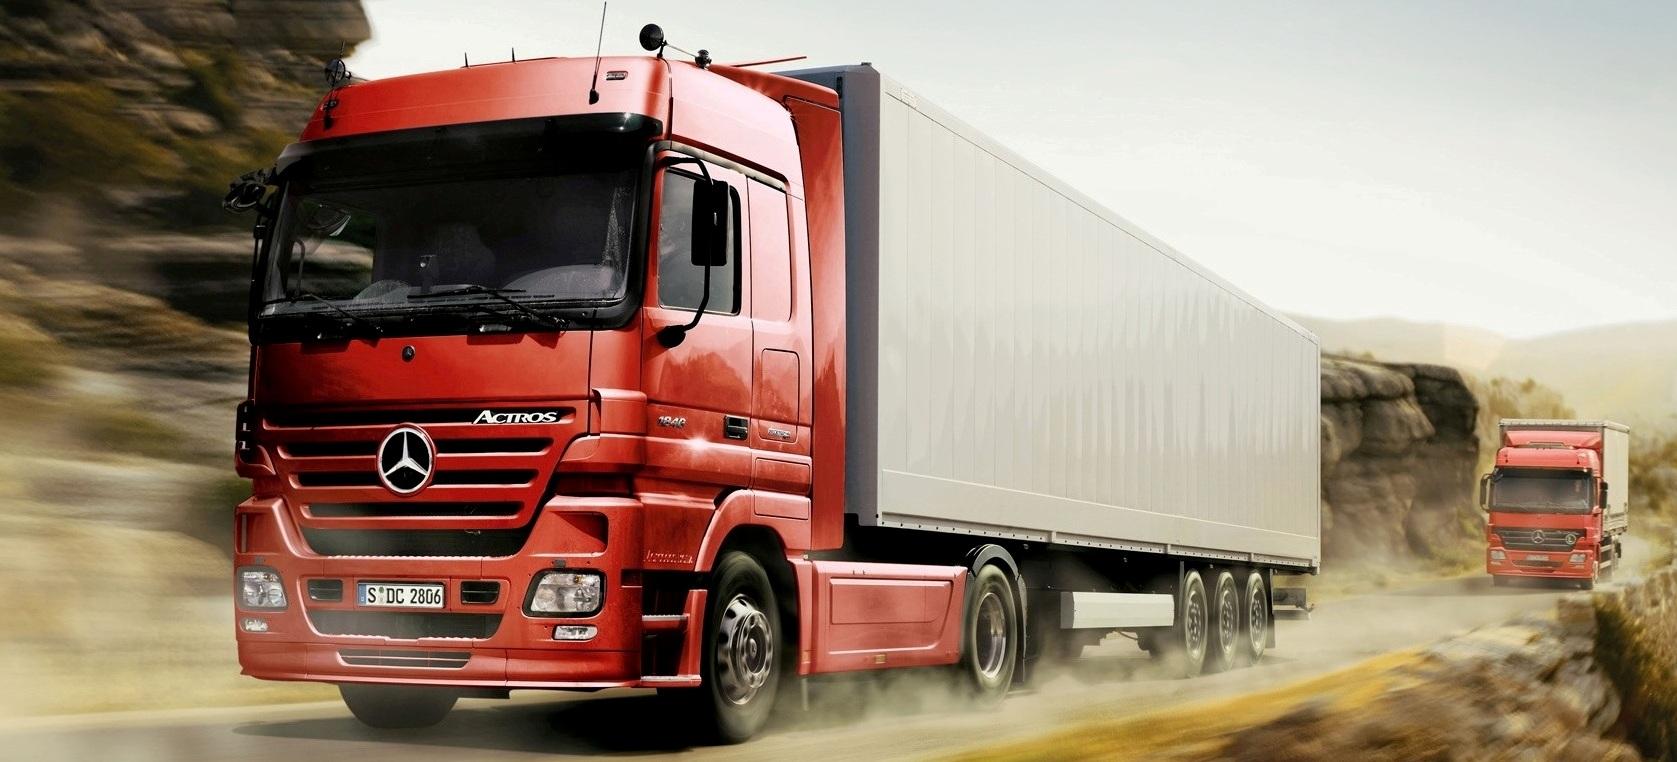 Road Transport, International Transport Container